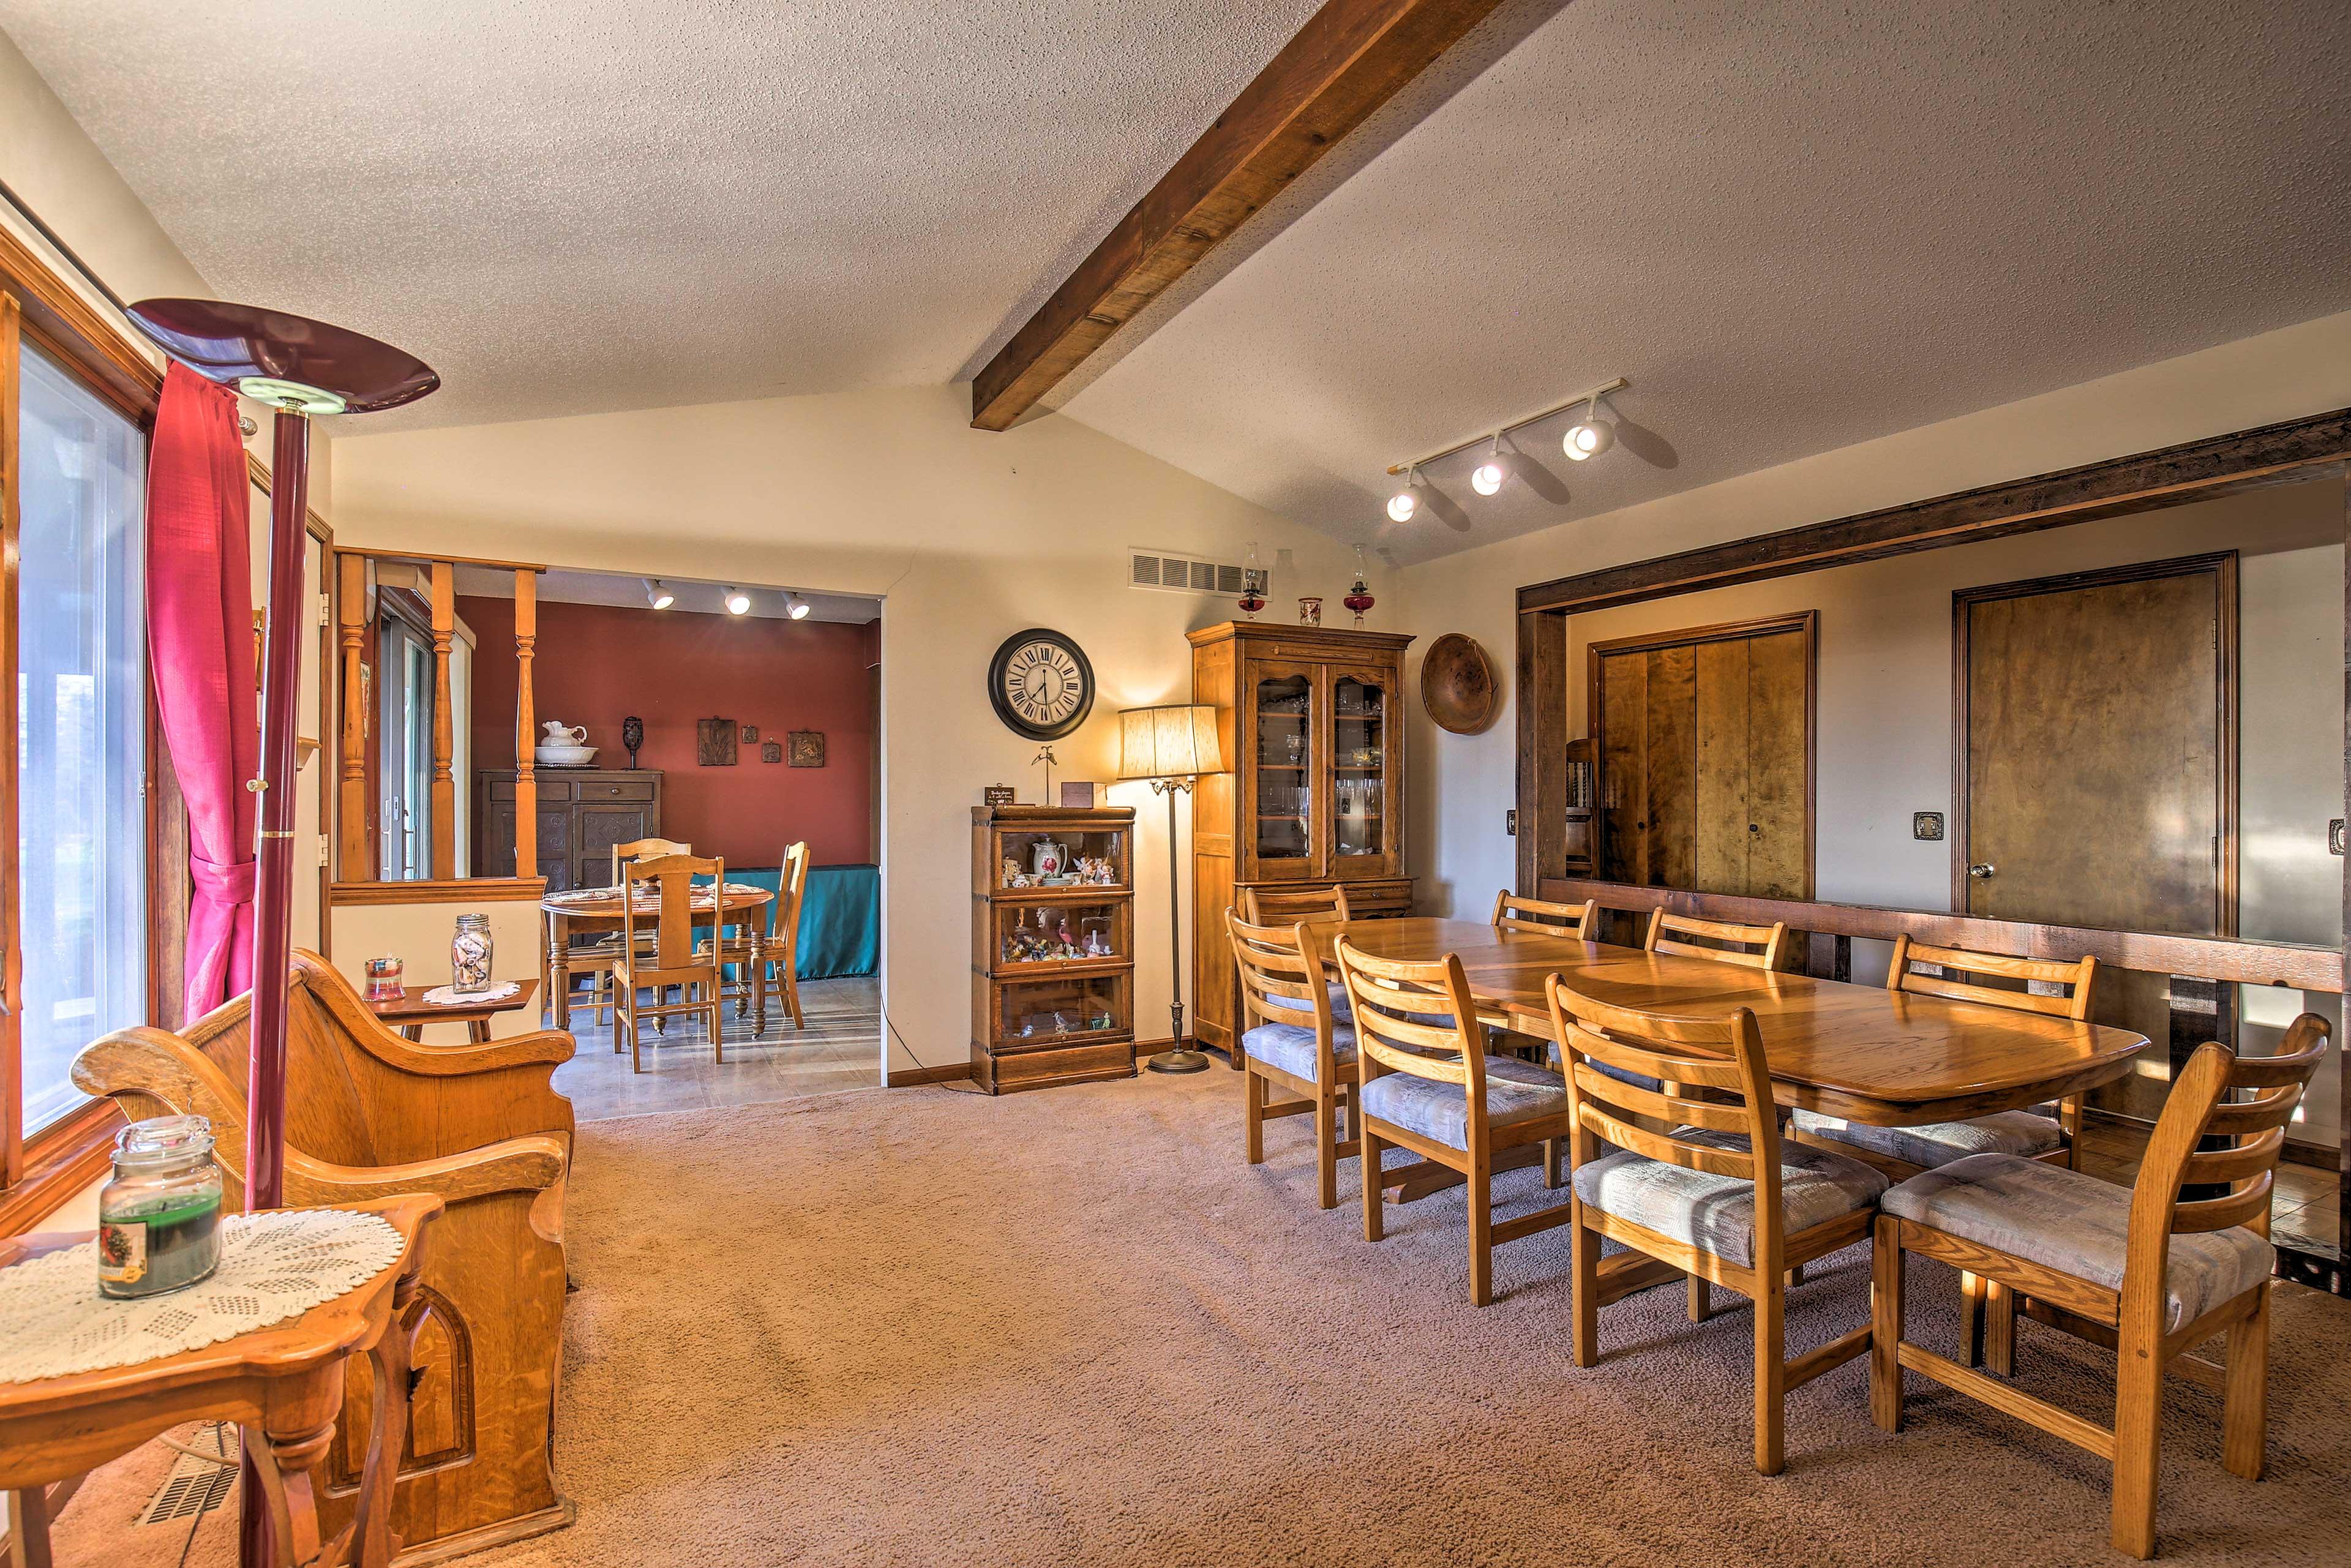 Sunlight streams into the living area to illuminate the open floor plan.